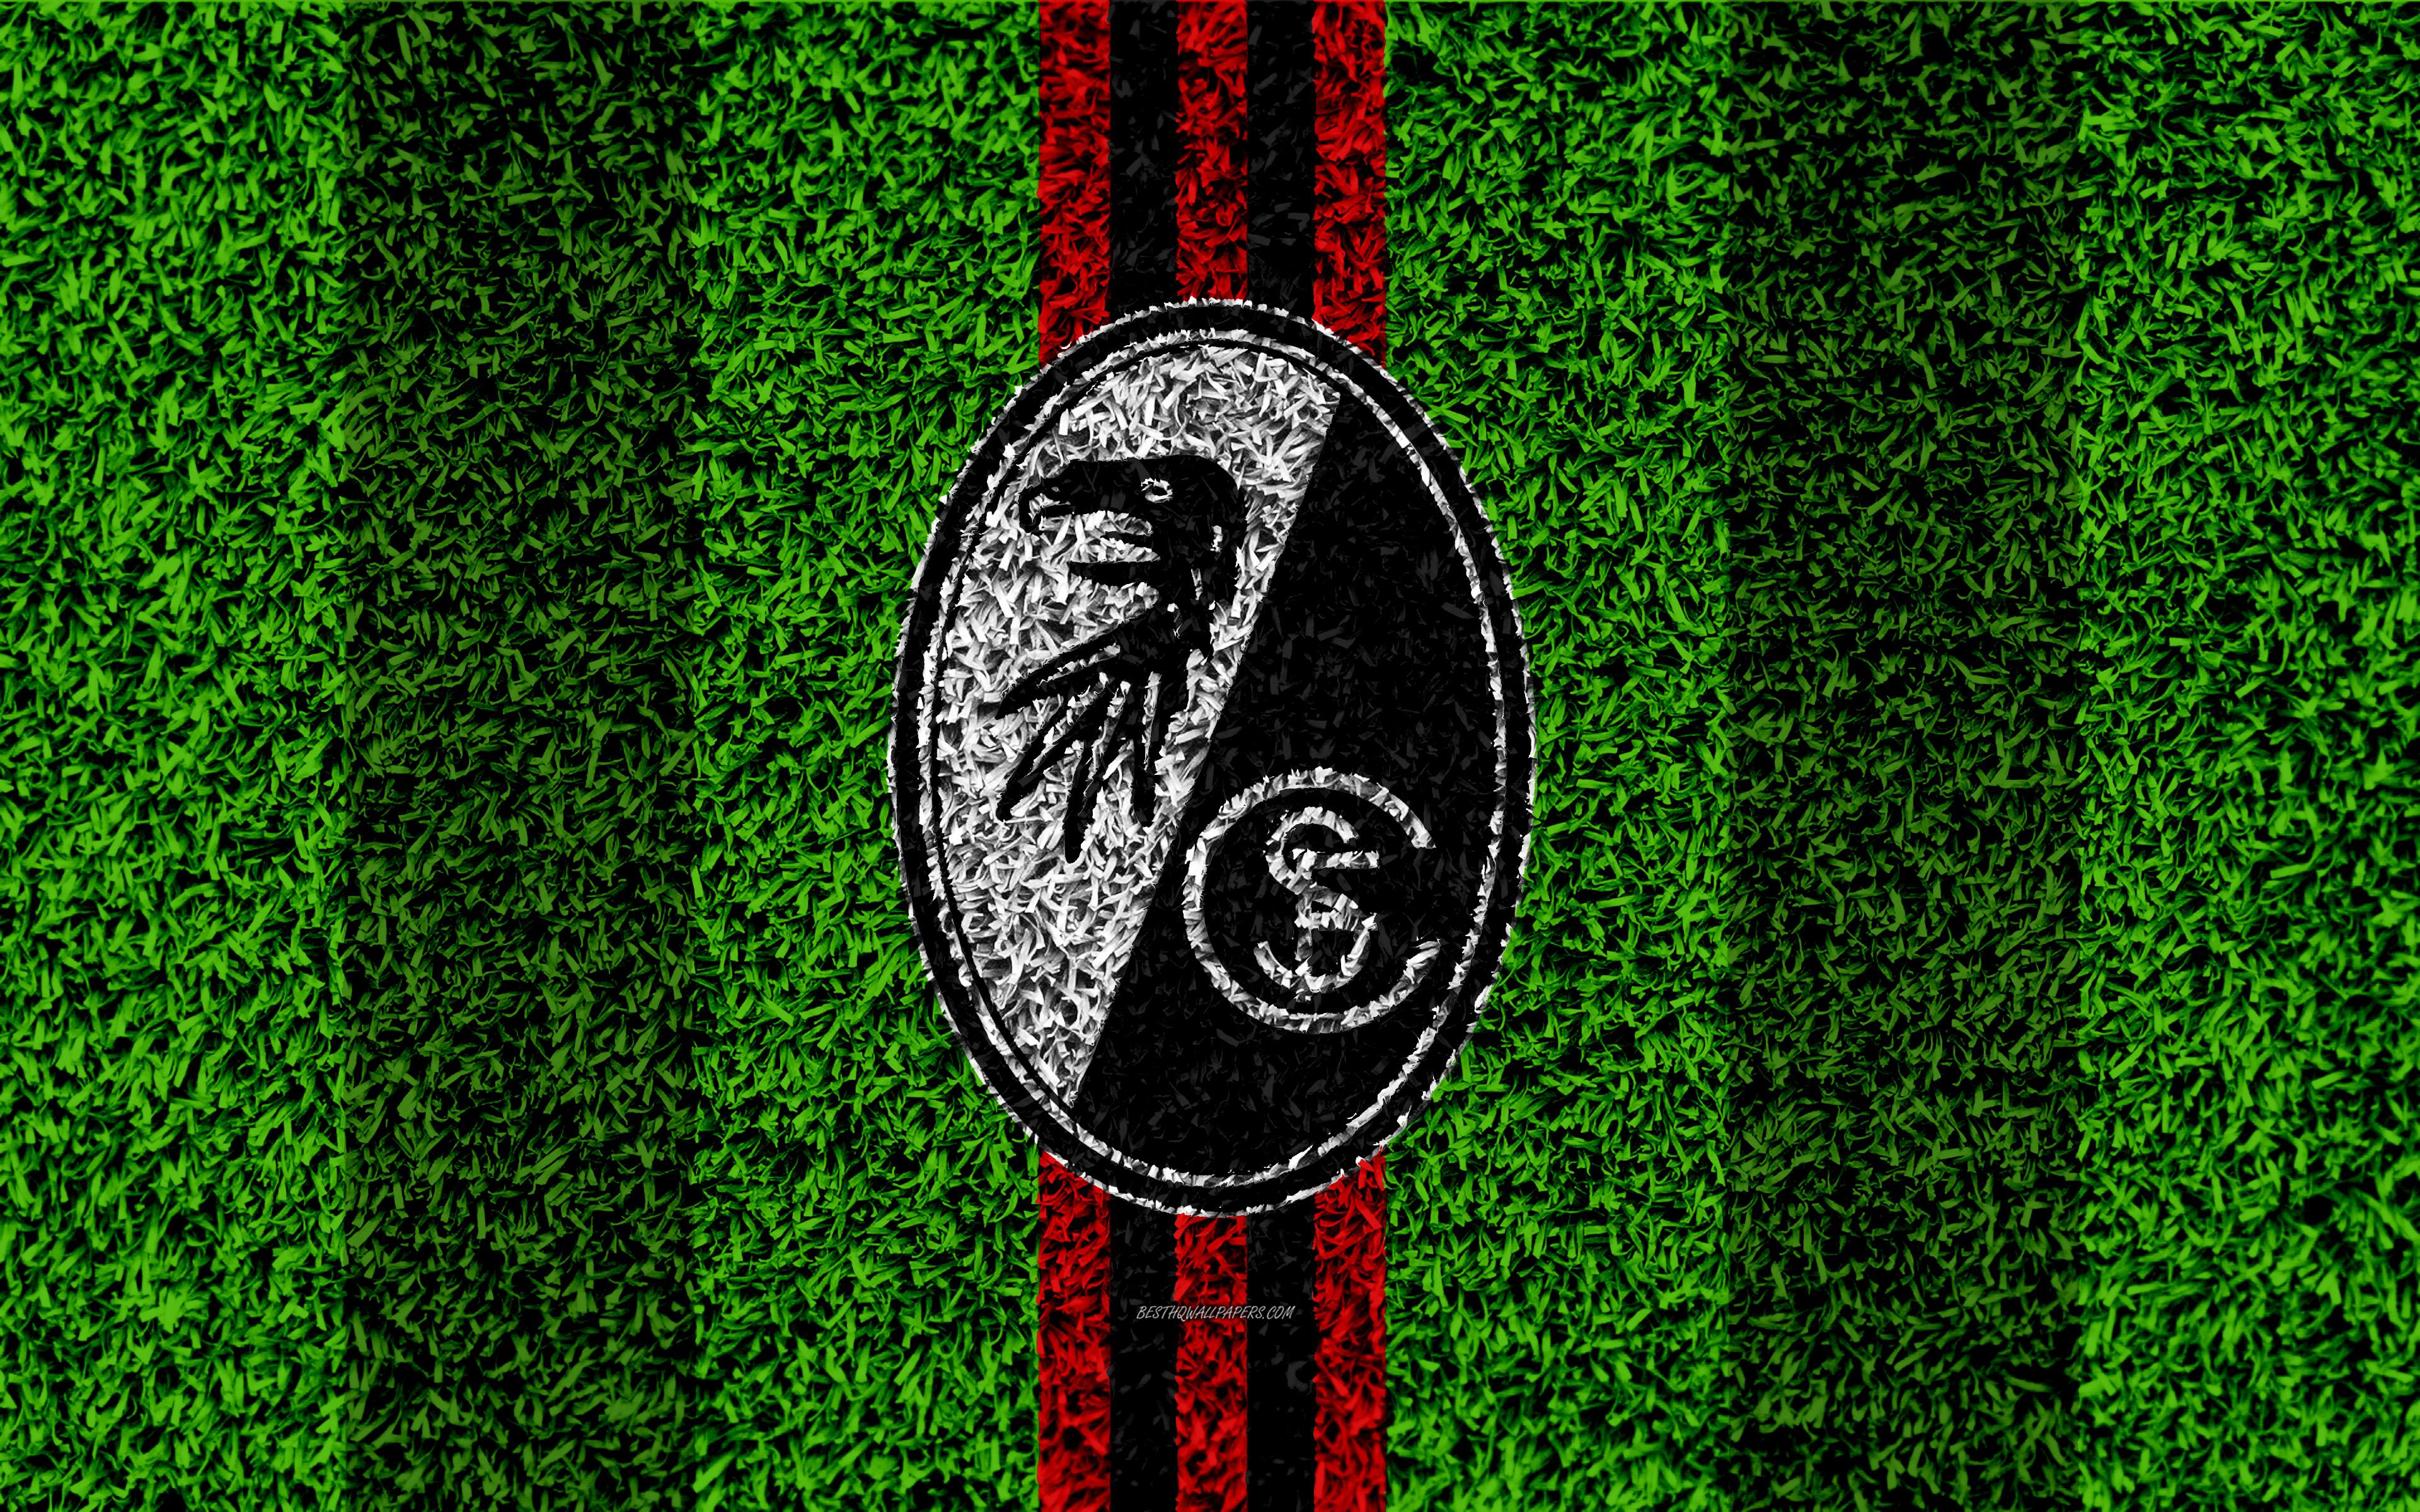 Download wallpapers SC Freiburg 4k German football club 3840x2400